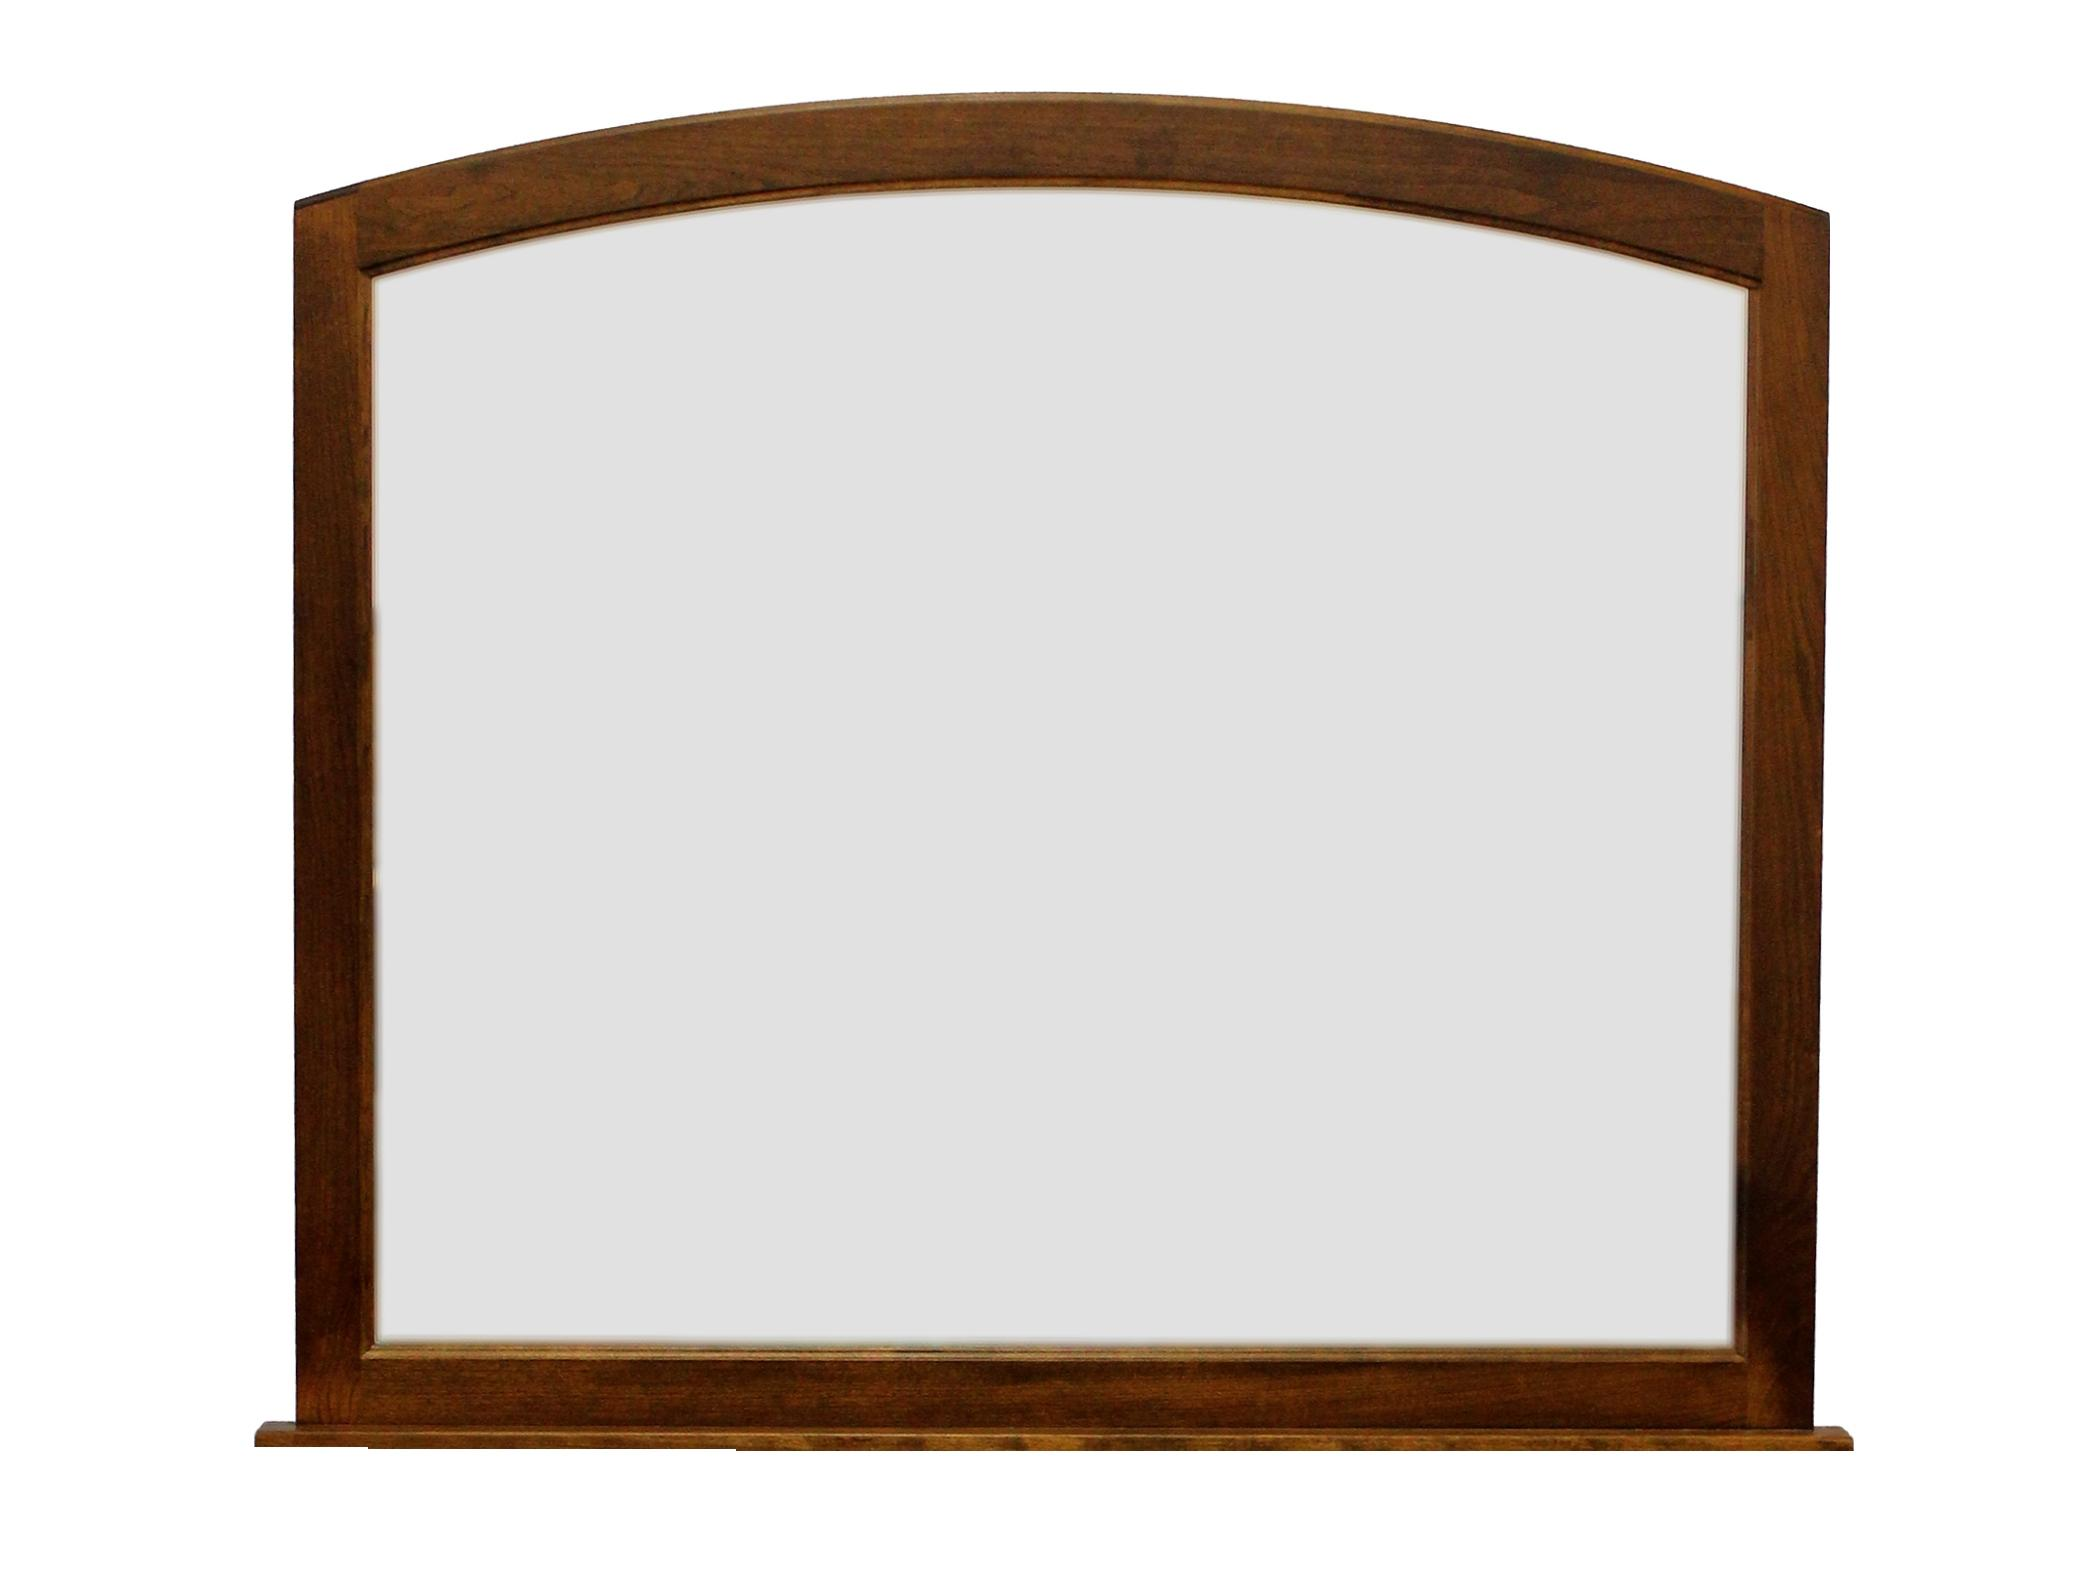 L.J. Gascho Furniture Covington Cairnbrook Mirror - Item Number: 2004-00